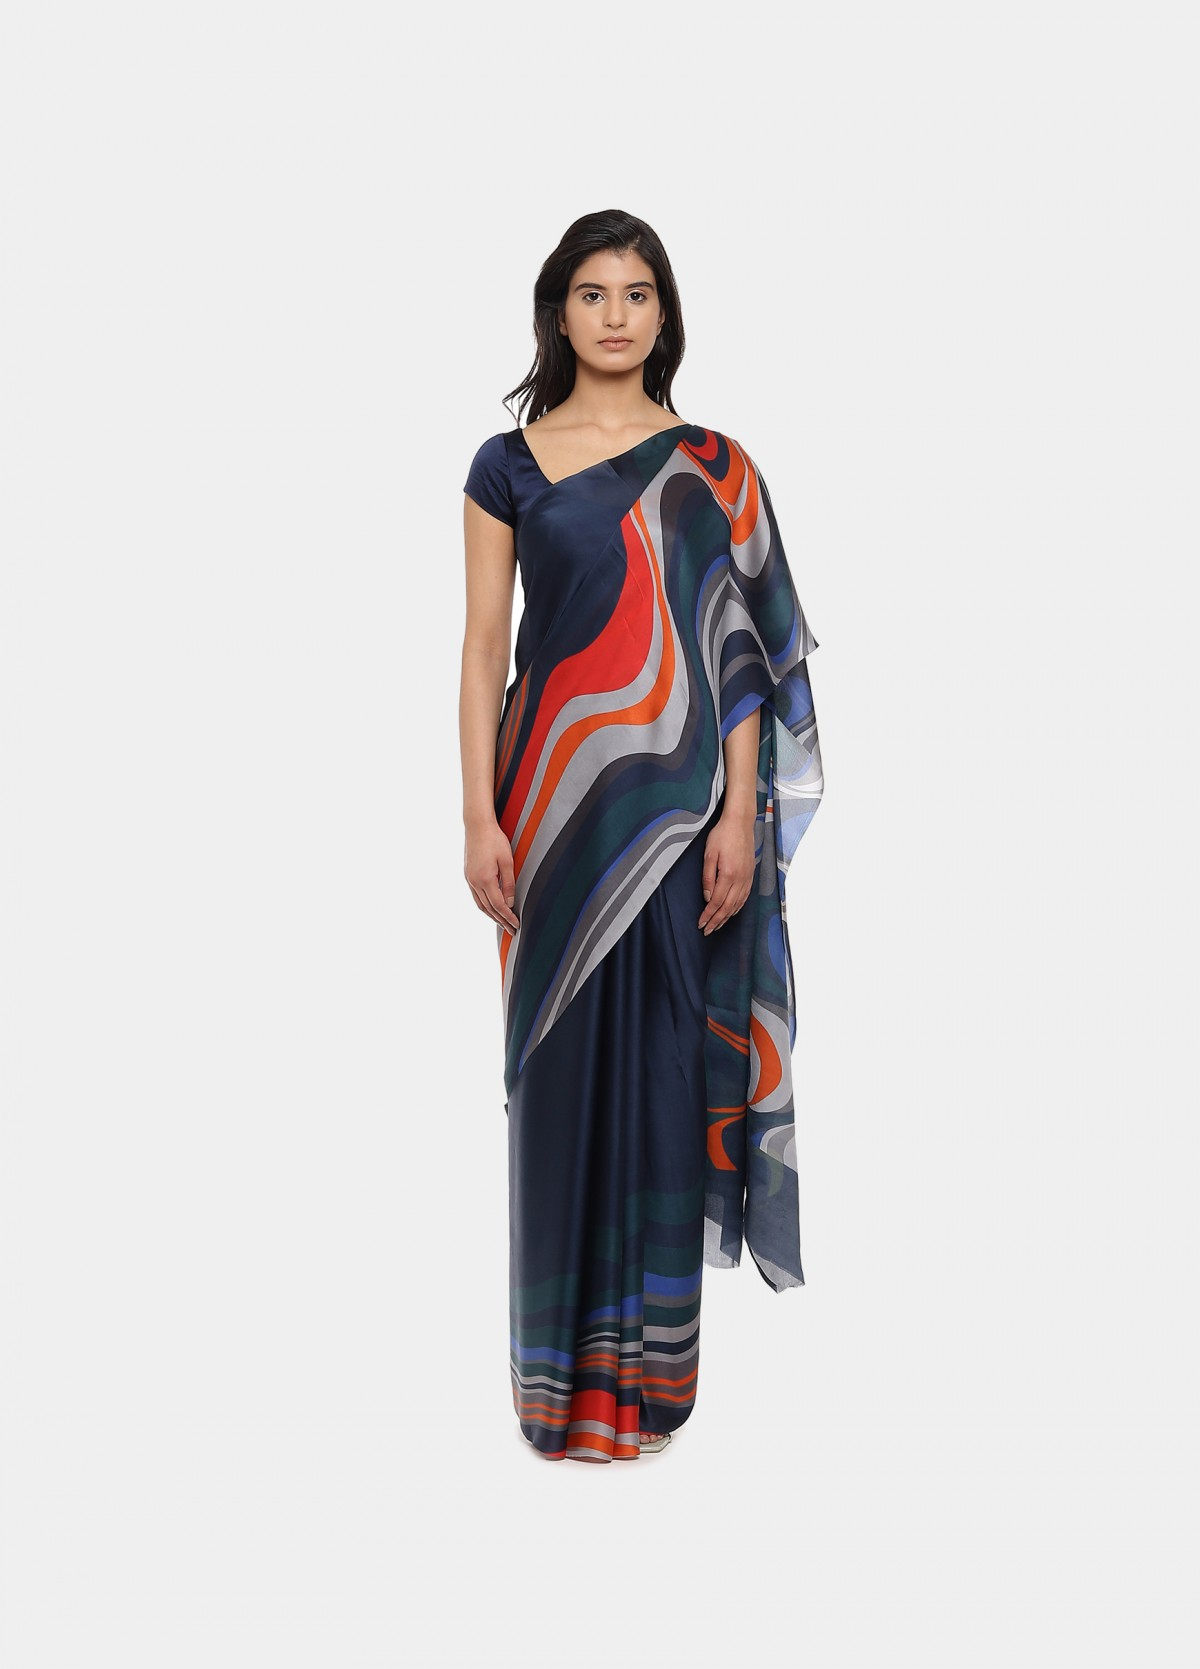 The Janis Sari